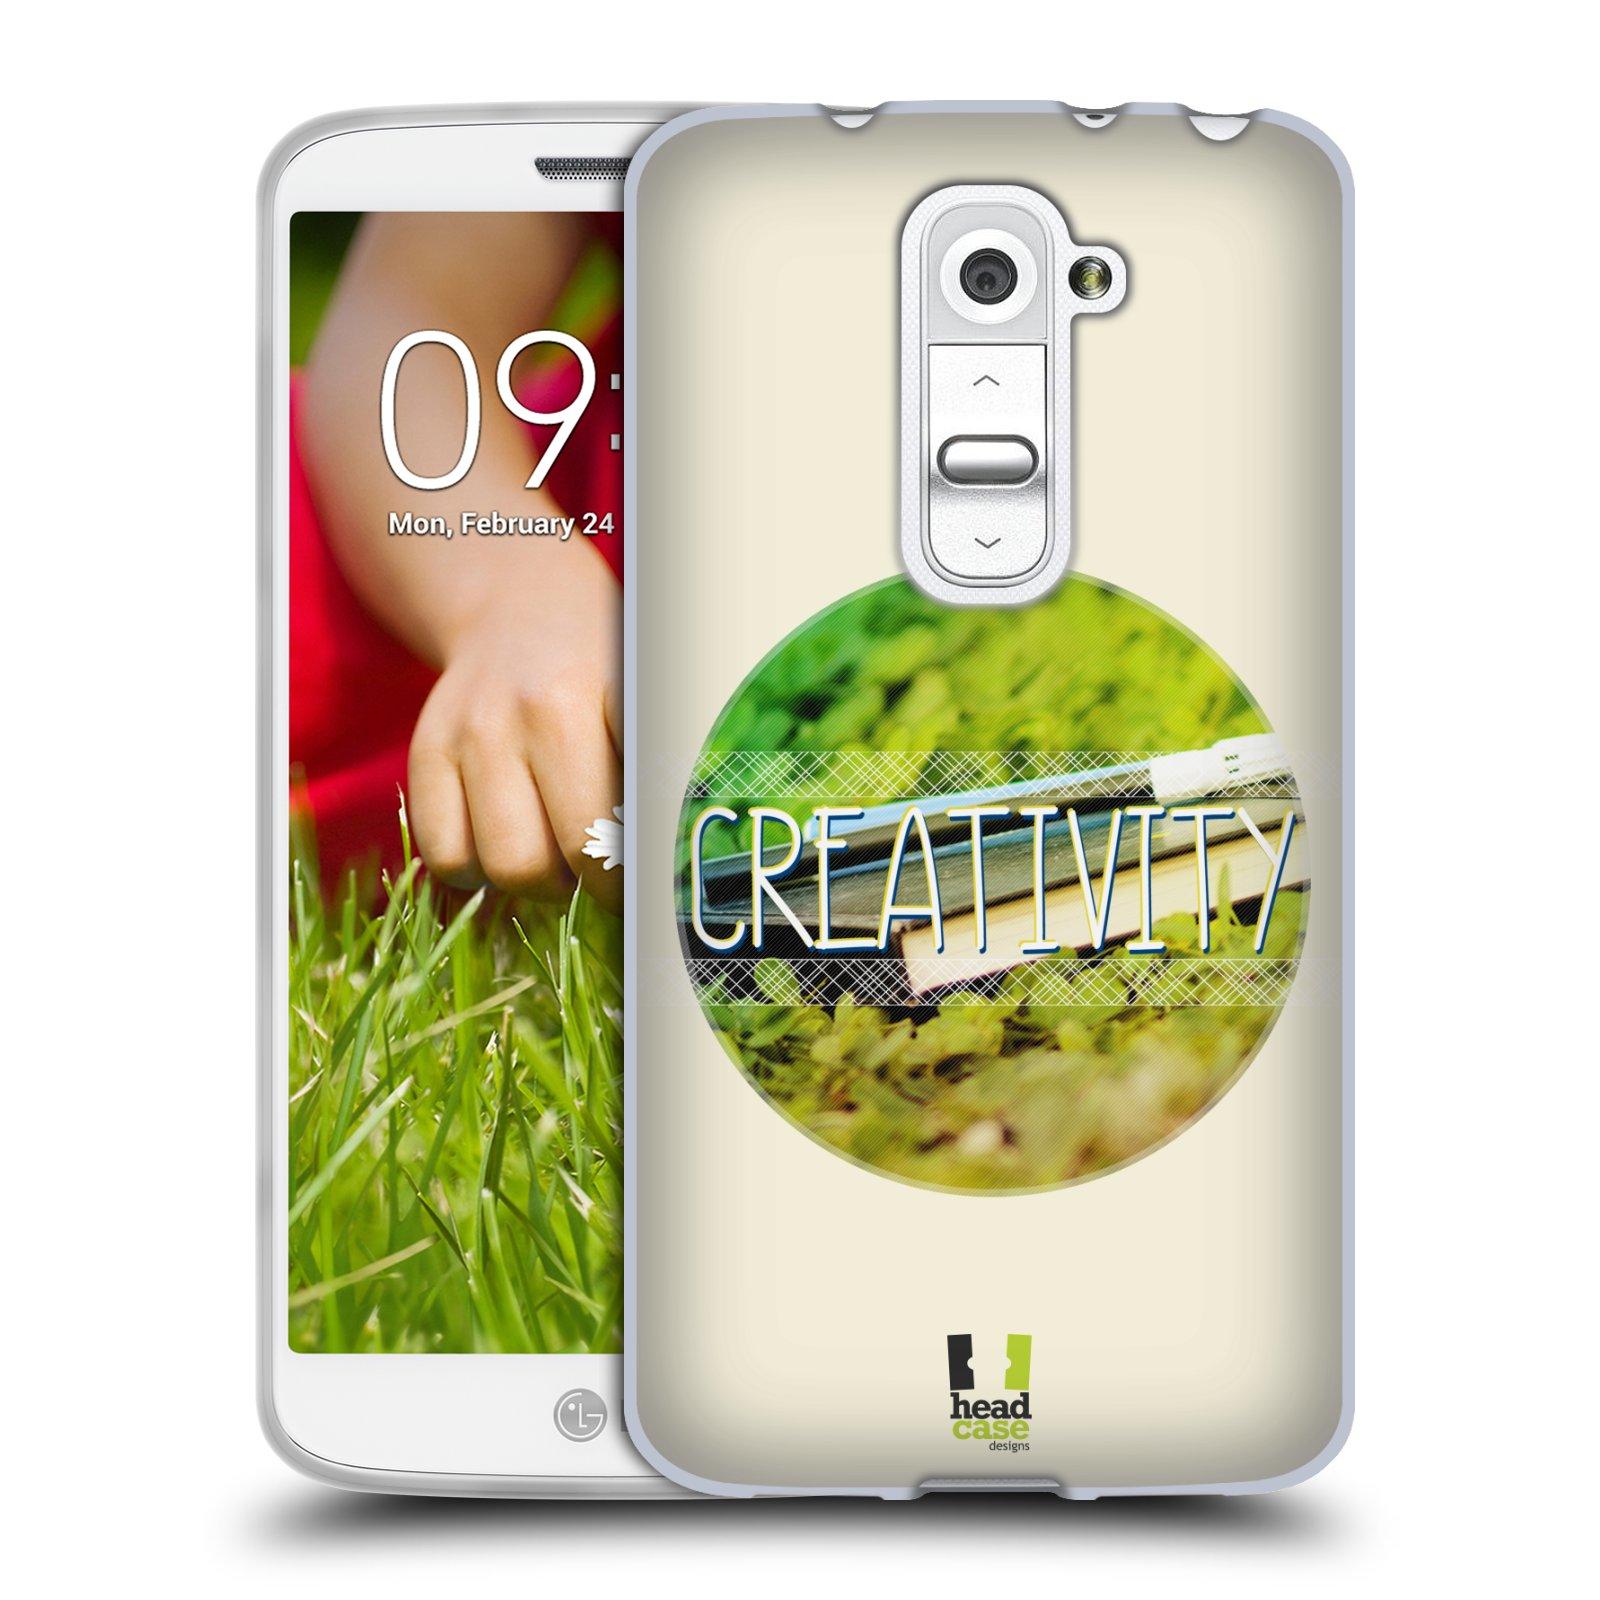 Silikonové pouzdro na mobil LG G2 Mini HEAD CASE INSPIRACE V KRUHU KREATIVITA (Silikonový kryt či obal na mobilní telefon LG G2 Mini D620)